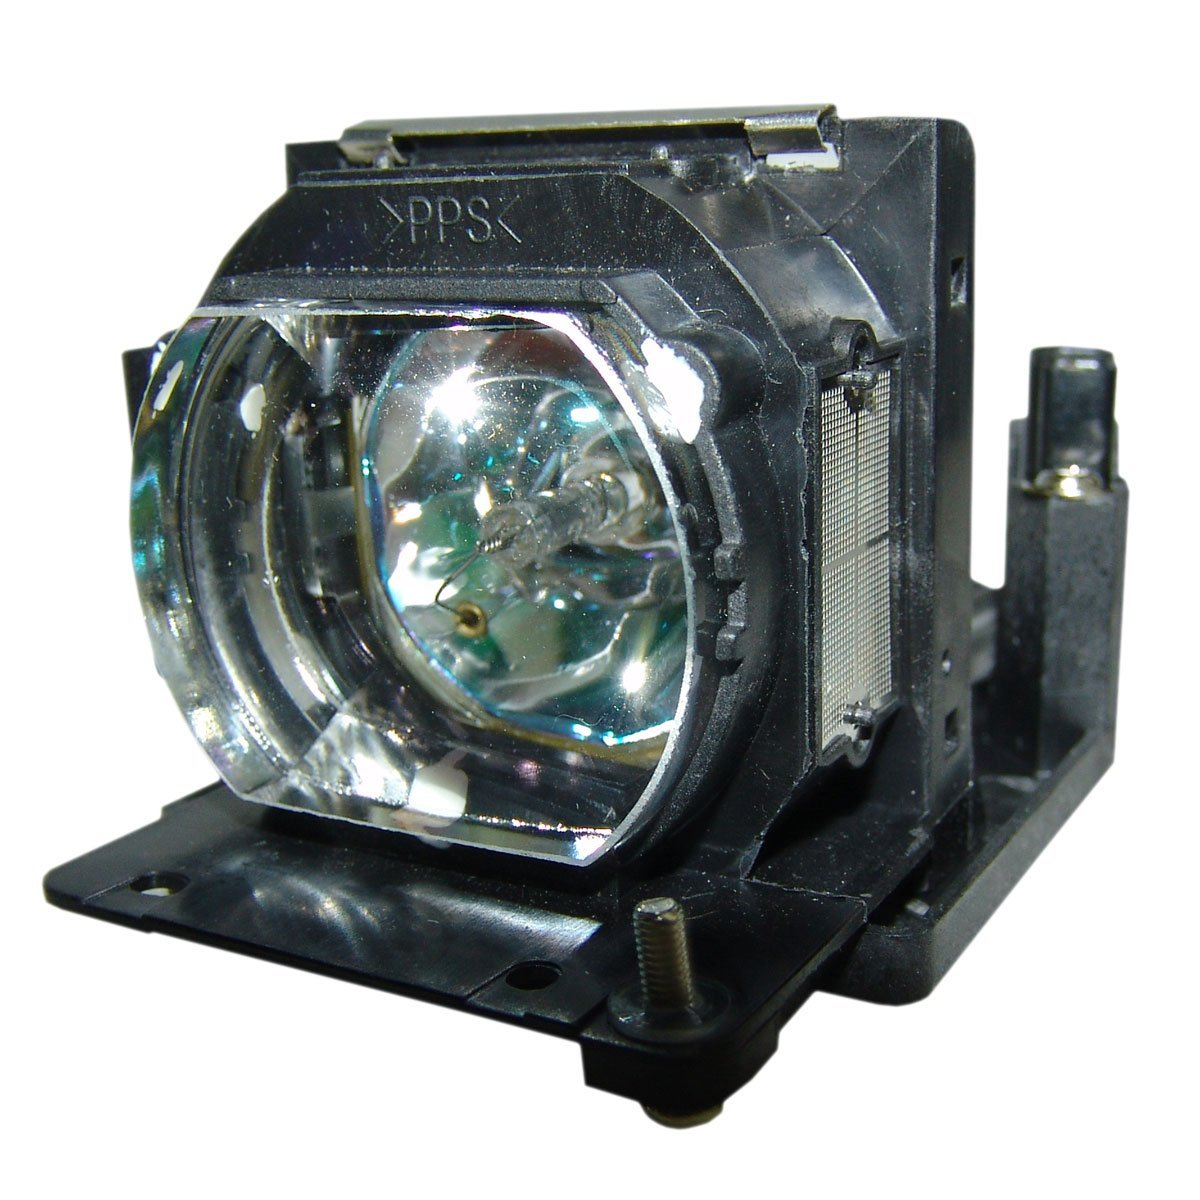 VLT-XL4LP VLTXL4LP XL4LP for MITSUBISHI SL4U SL4 SL4SU XL4 XL4U XL8U Projector Bulb Lamp with housing phil collins singles 4 lp